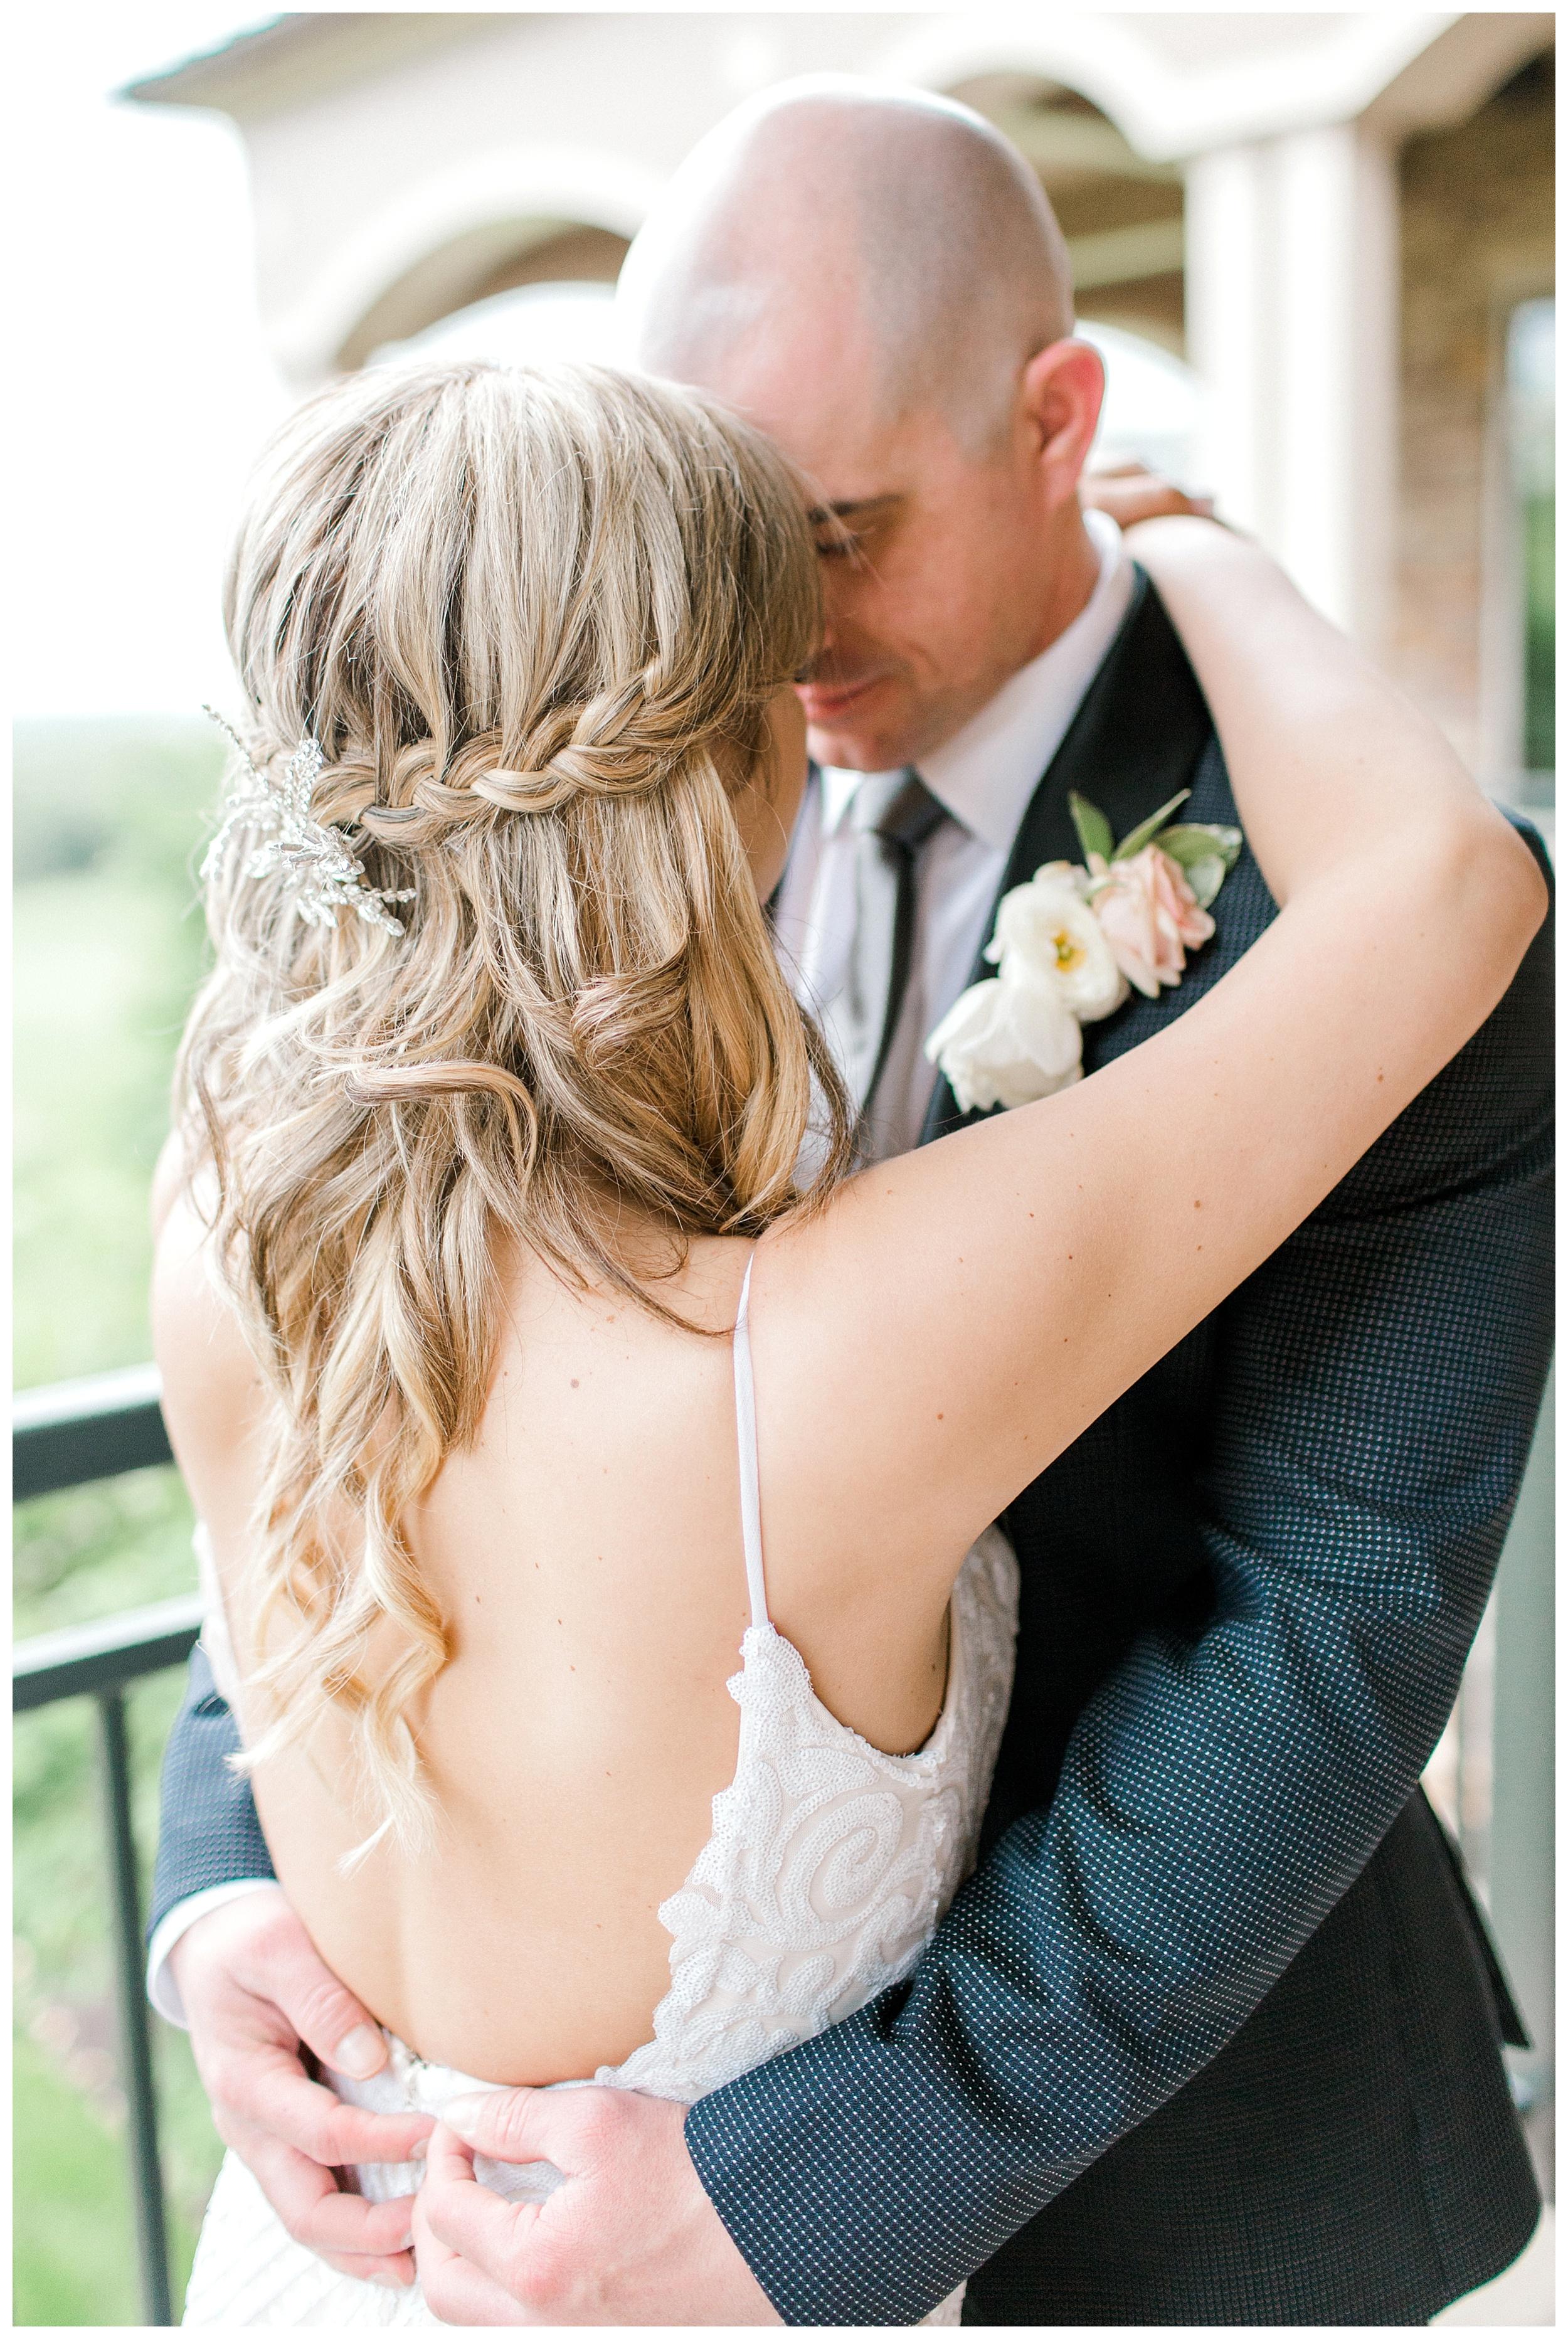 Lansdowne Resort Wedding | Virginia Film Wedding Photographer Kir Tuben_0061.jpg